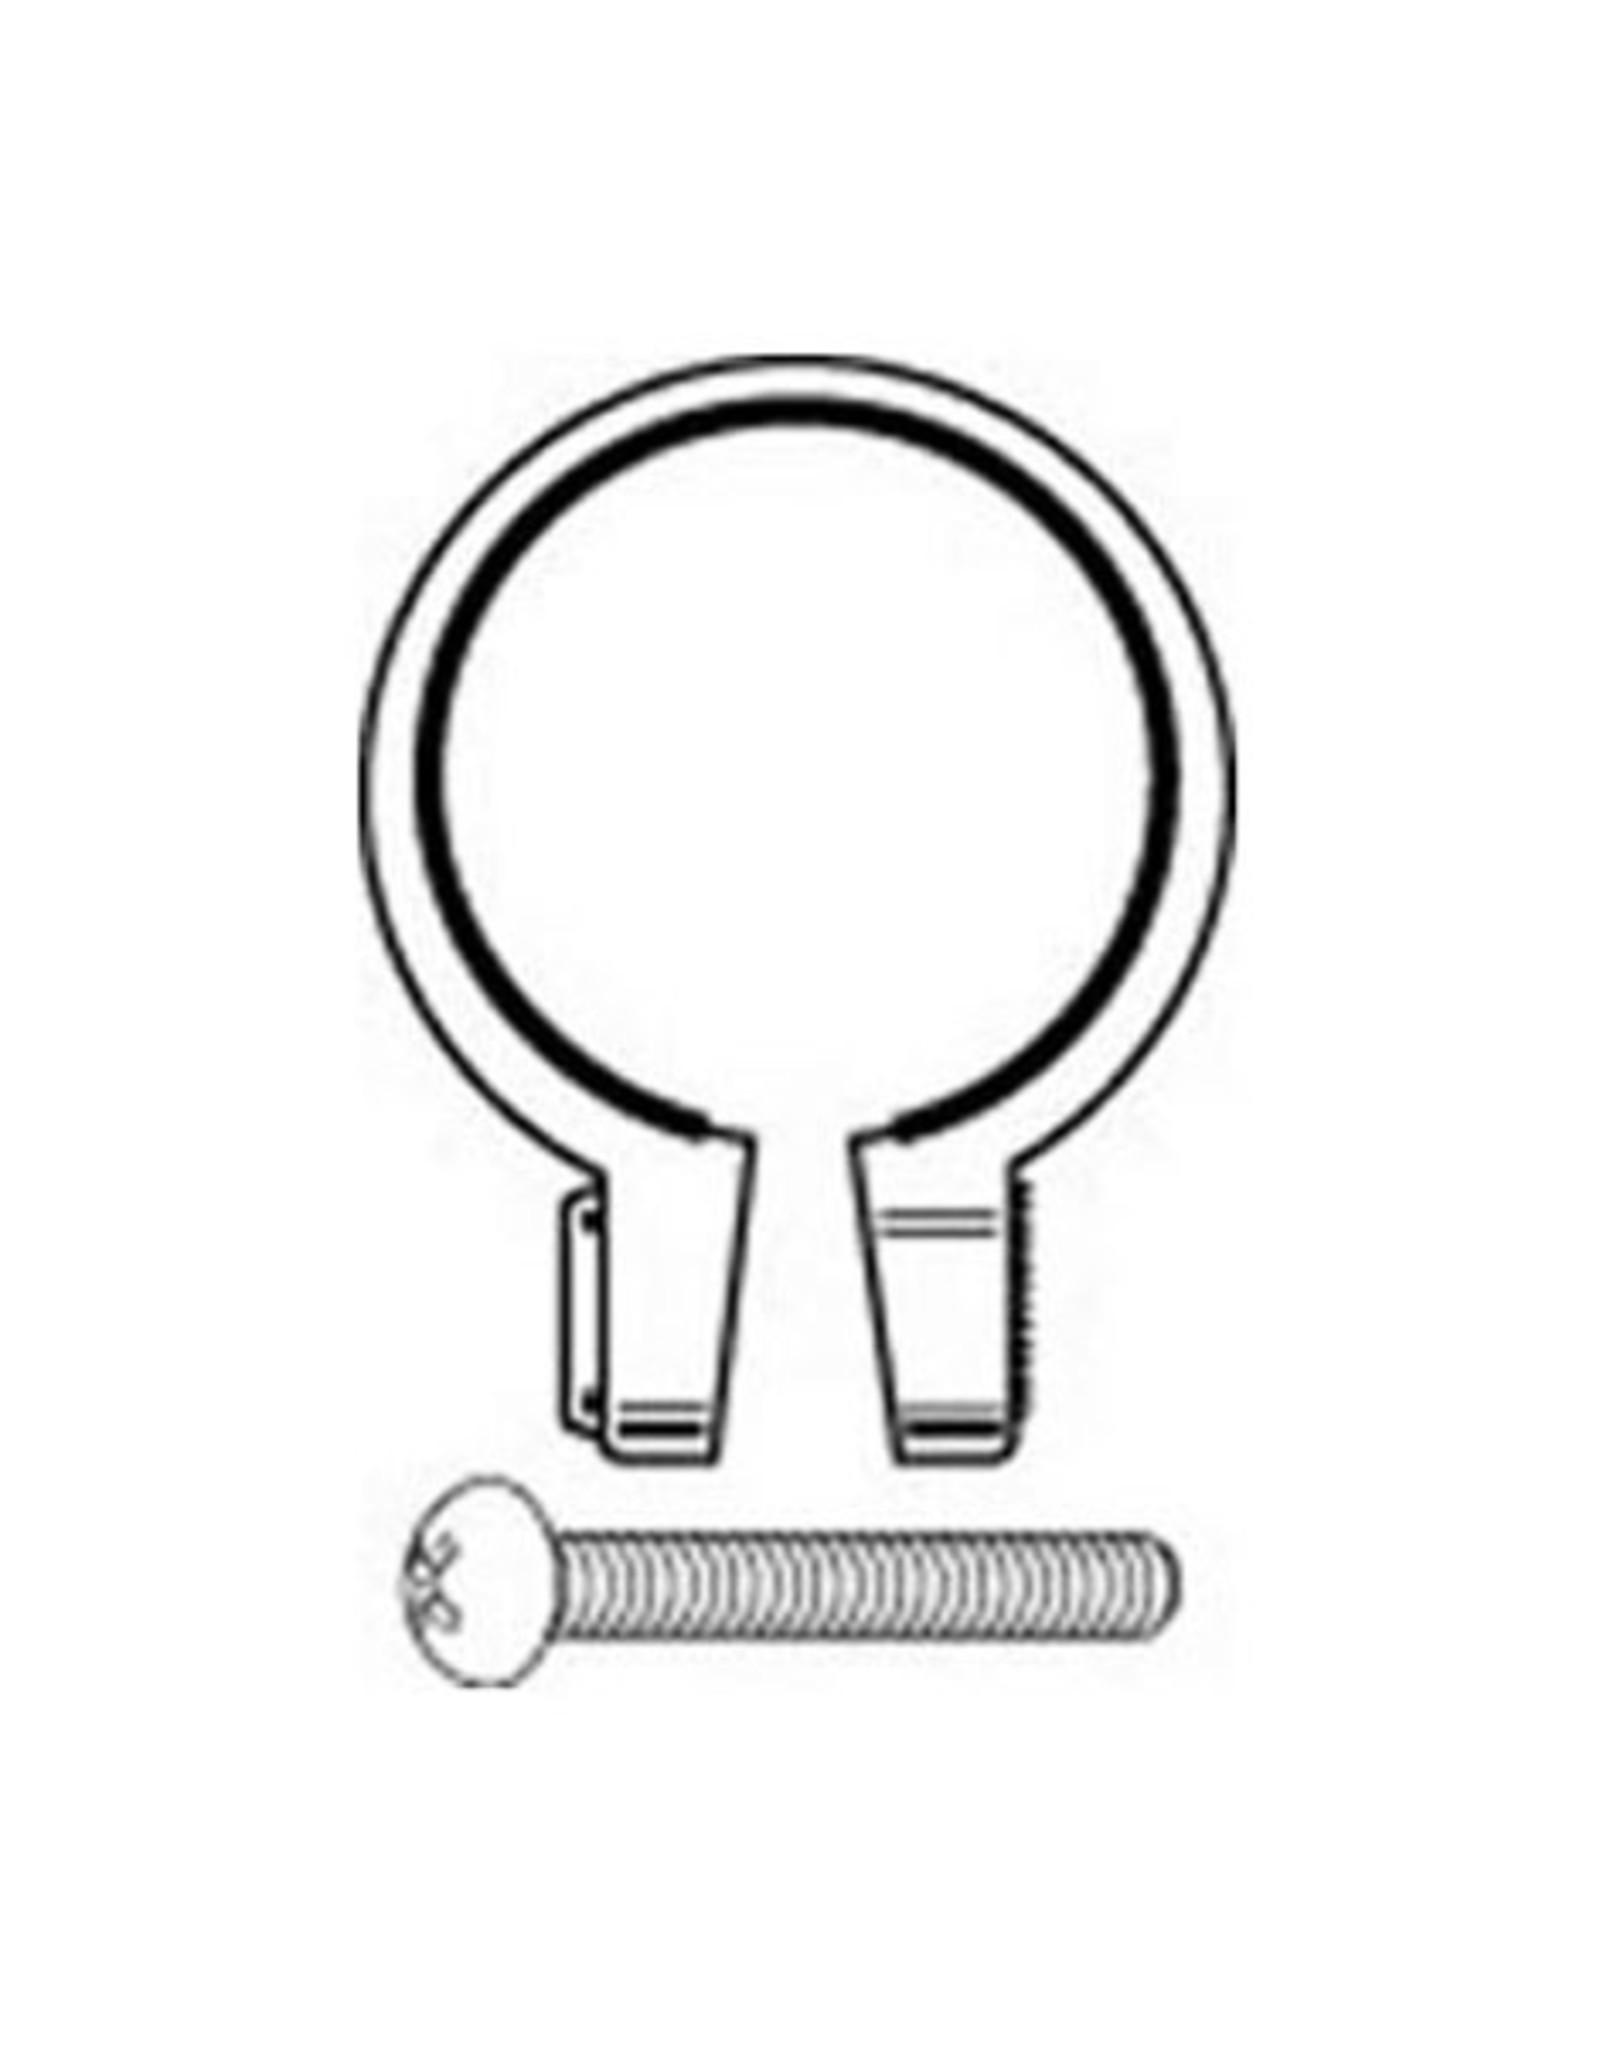 Cateye Light Clamp SP8 31.0-34.5mm